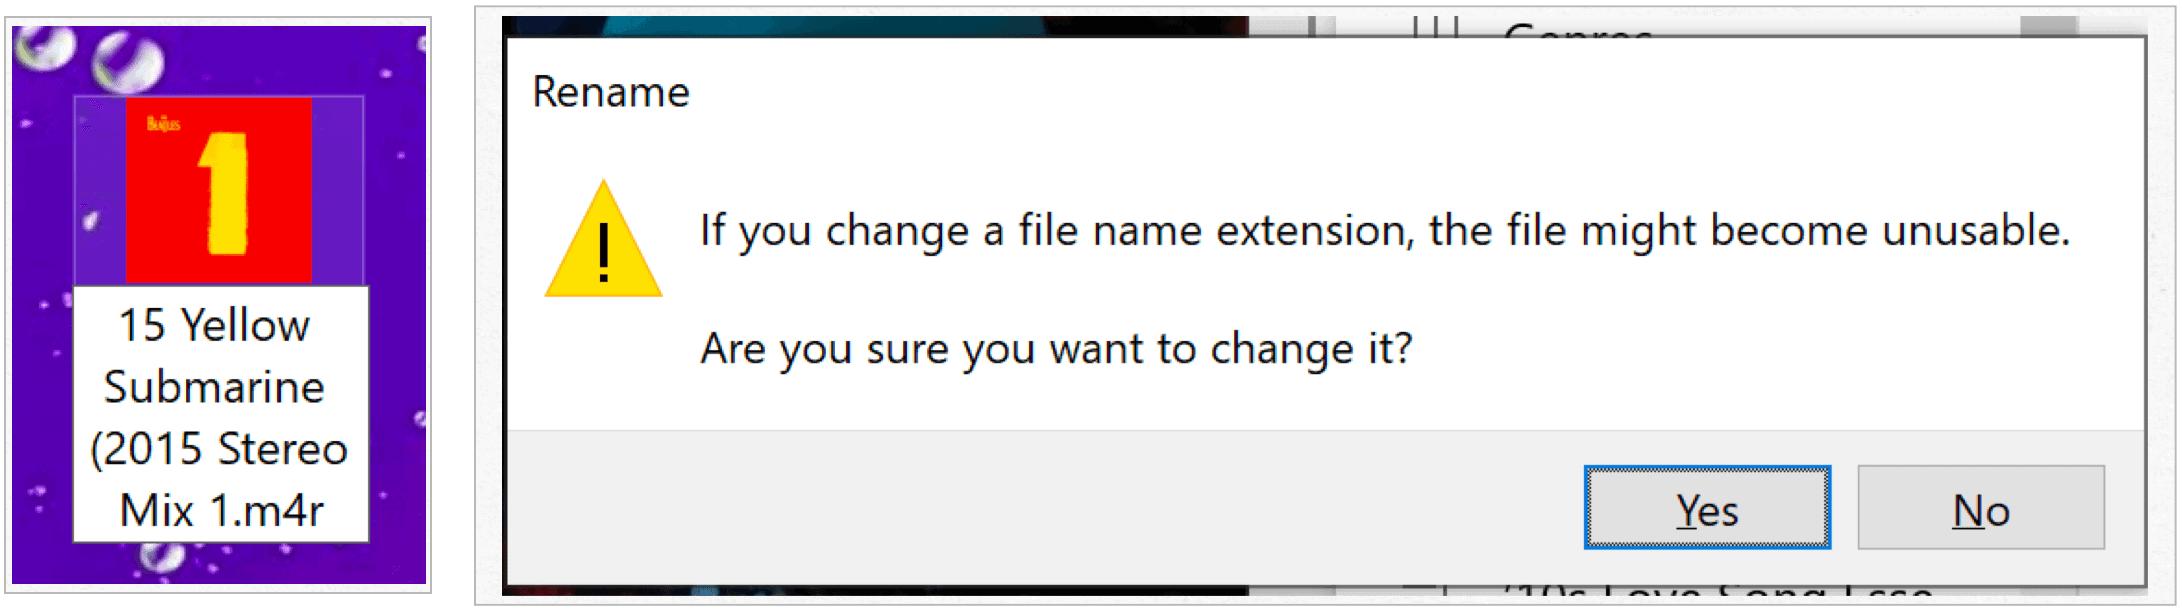 Windows confirm file extension change